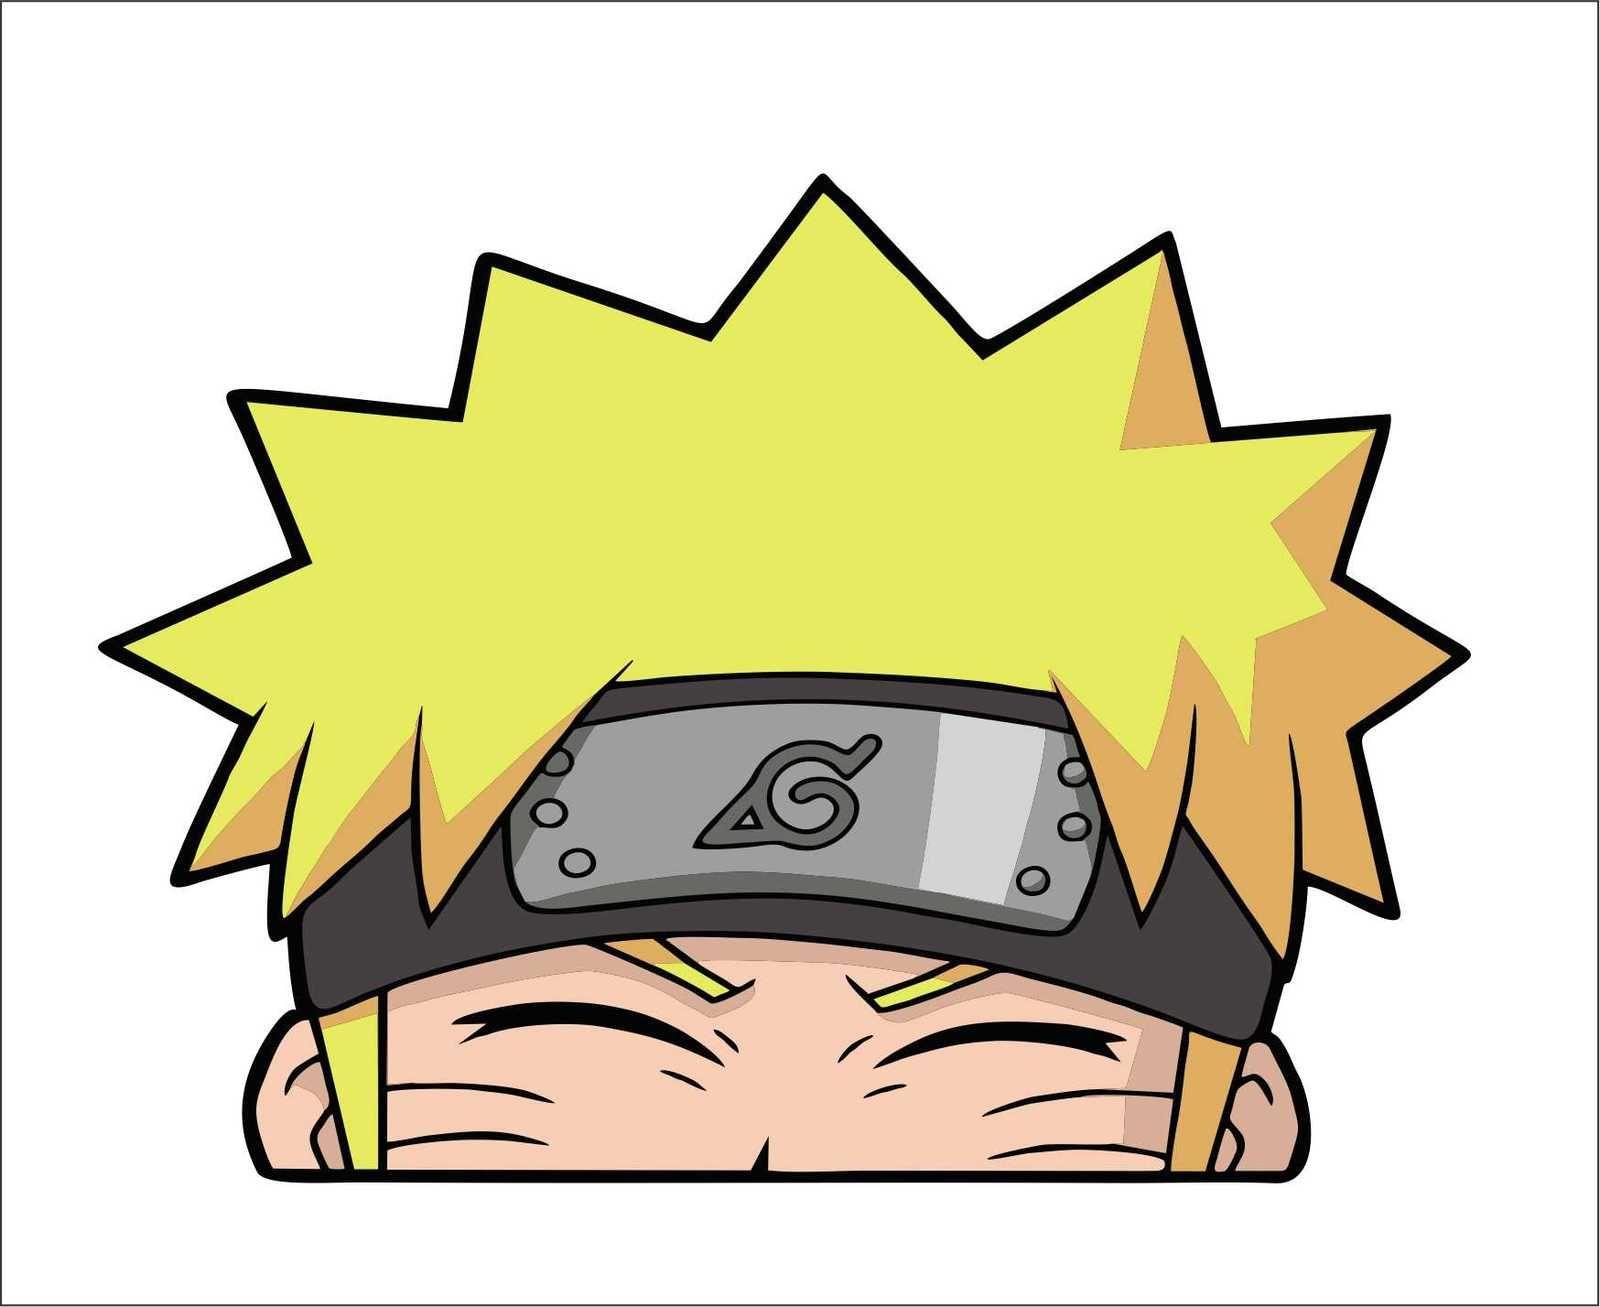 Naruto Smiling Peeker Peeking Peeker Window Vinyl Decal Sticker Anime Jdm Anime Chibi Anime Stickers Anime Printables [ 1307 x 1600 Pixel ]